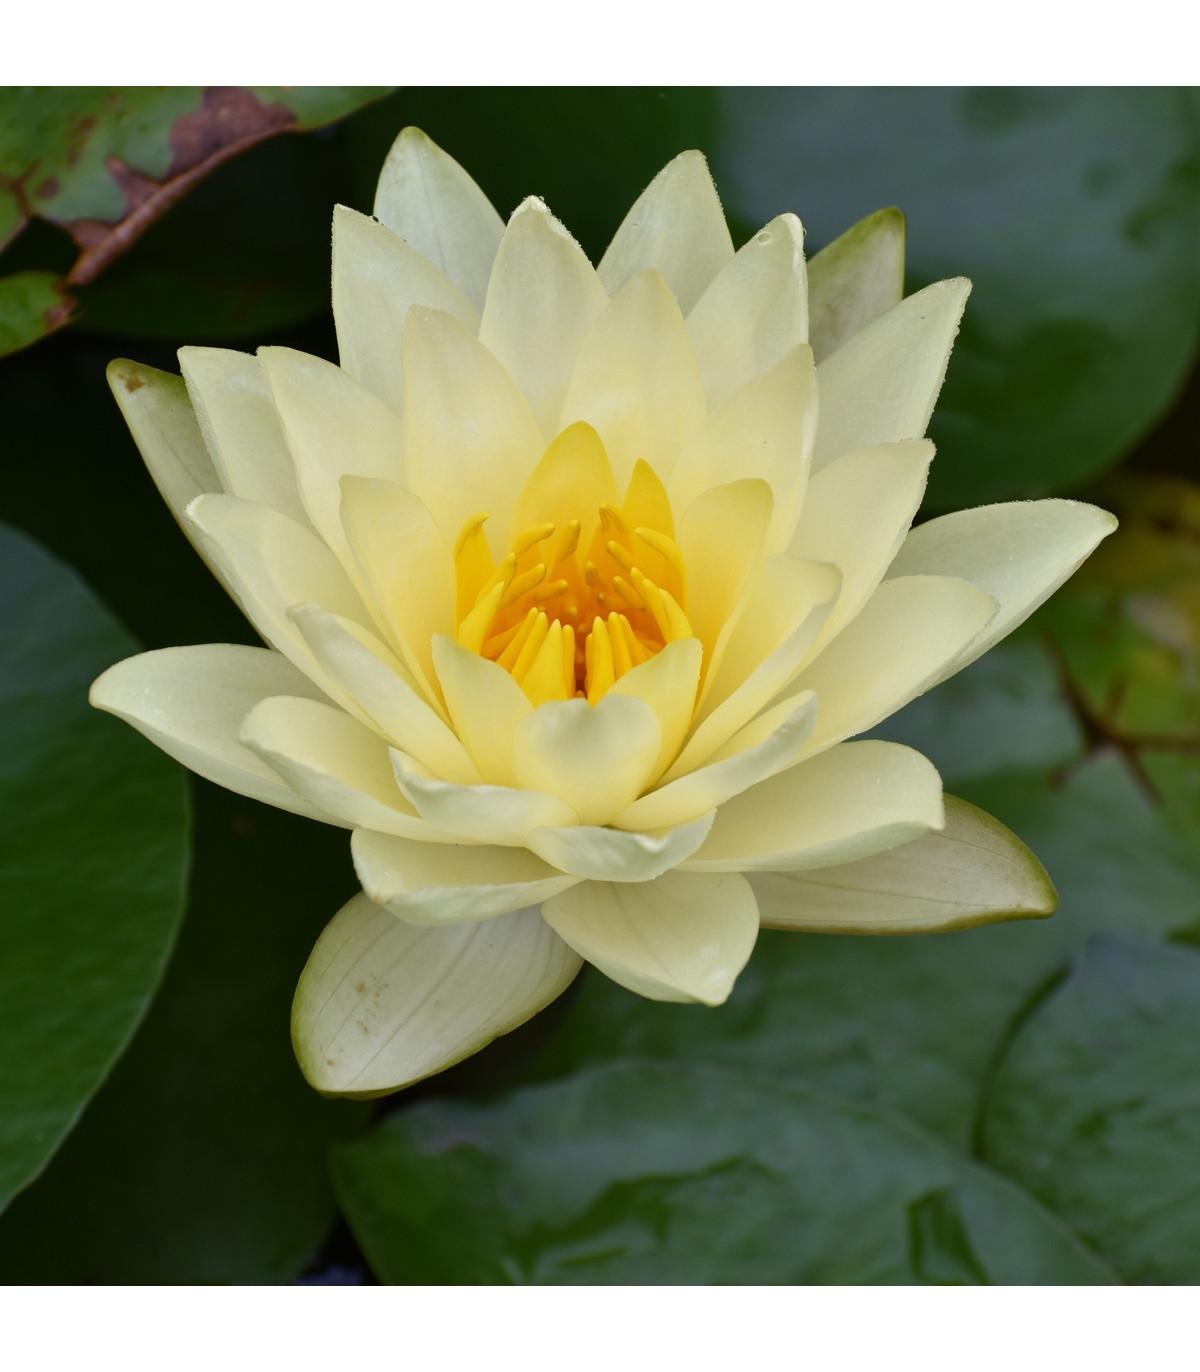 Leknín bílý - Nymphaea ampla - semena Leknínu - rostliny do jezírka - 6 ks